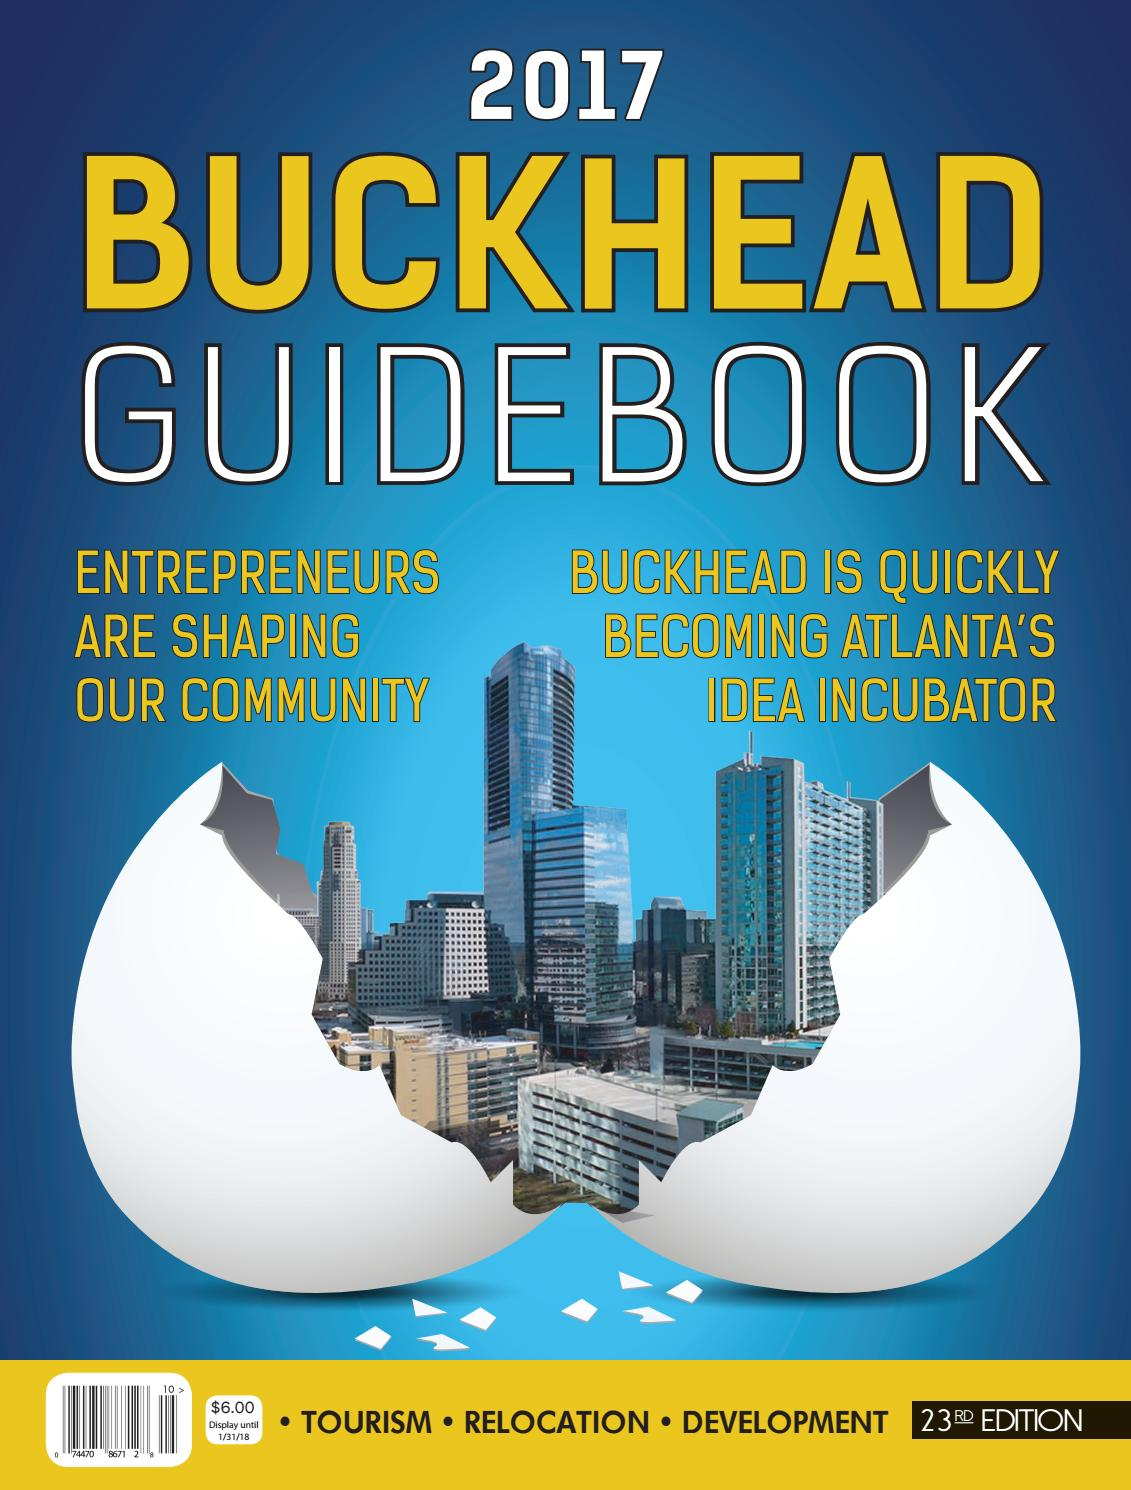 2017 Buckhead Guidebook by PubMan, Inc. issuu